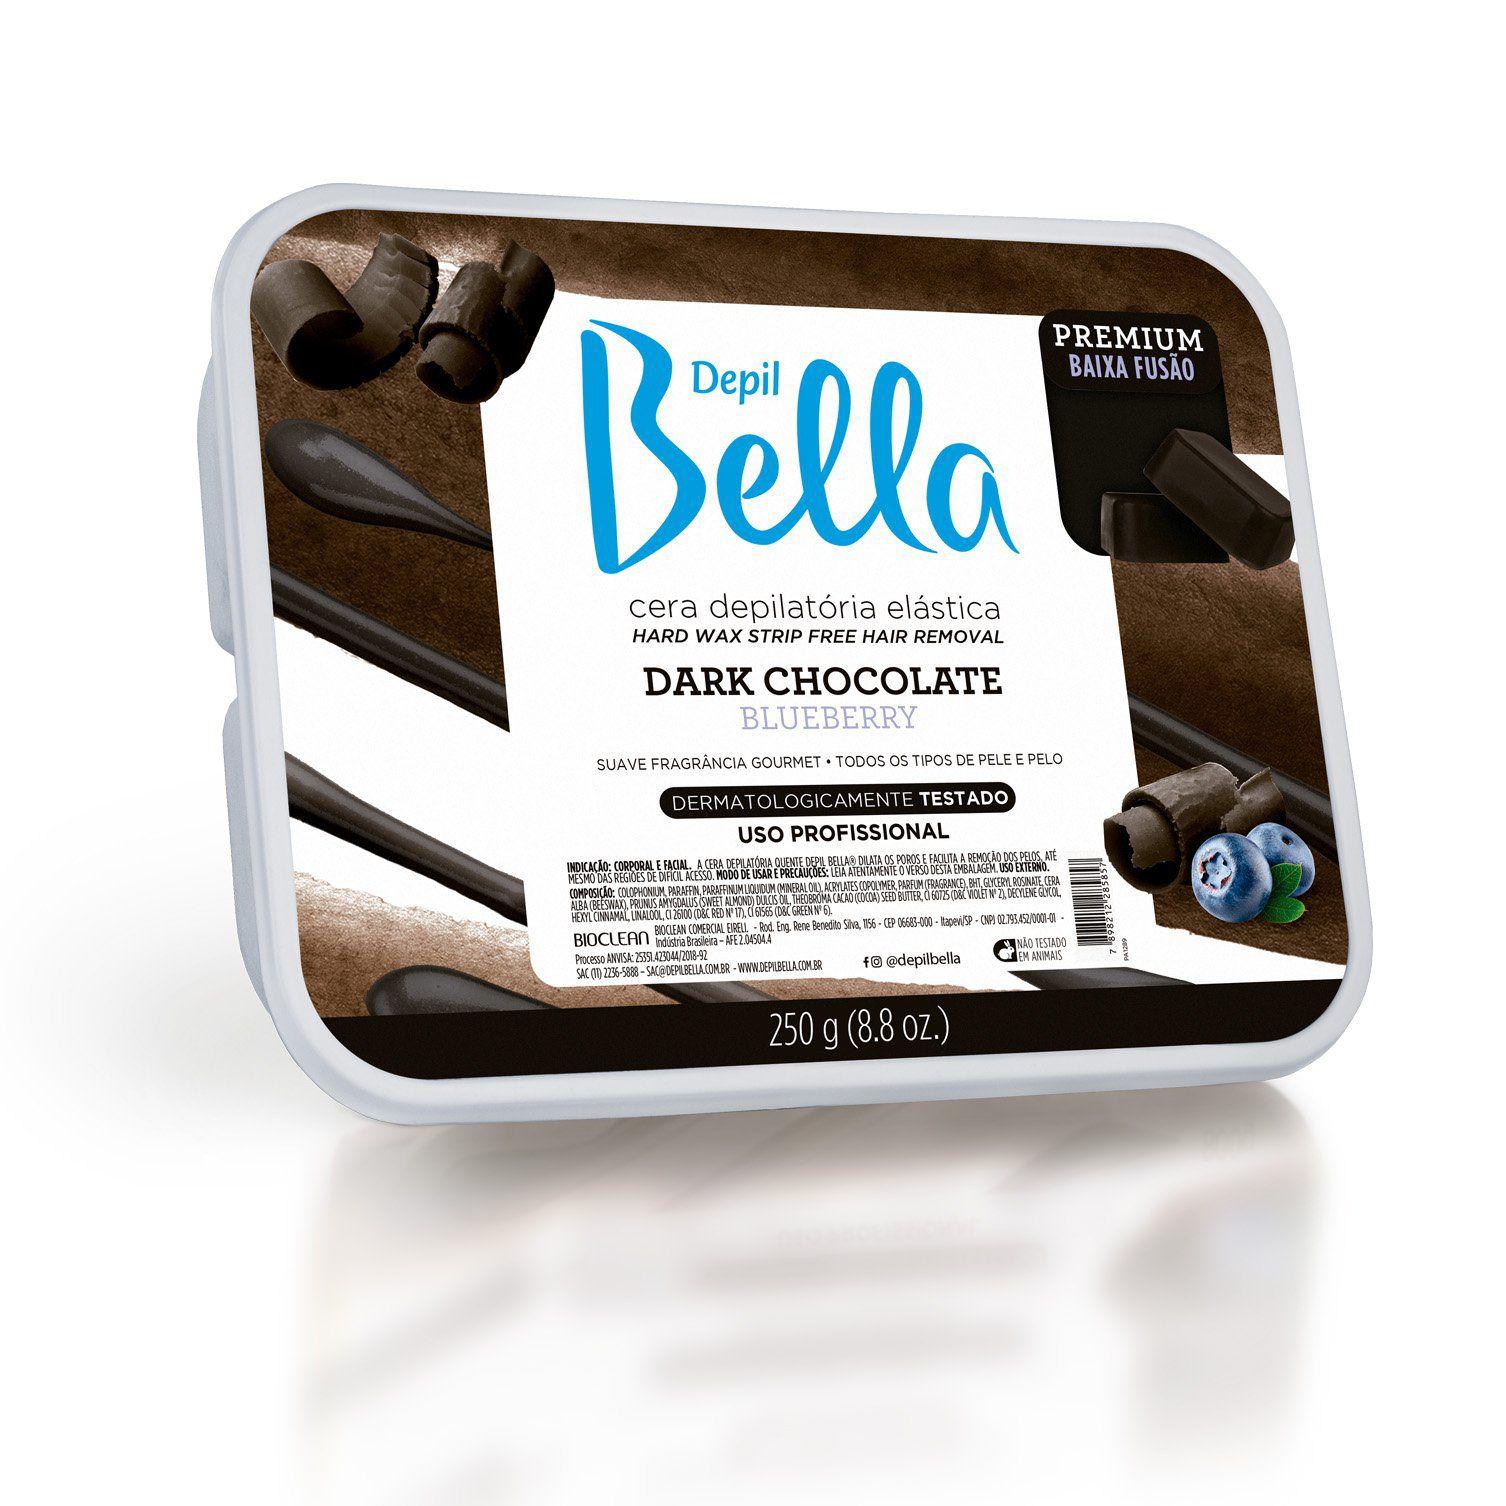 CERA DEPILATÓRIA ELASTICA DARK CHOCOLATE BLUEBERRY - PREMIUM DEPIL BELLA - 250G